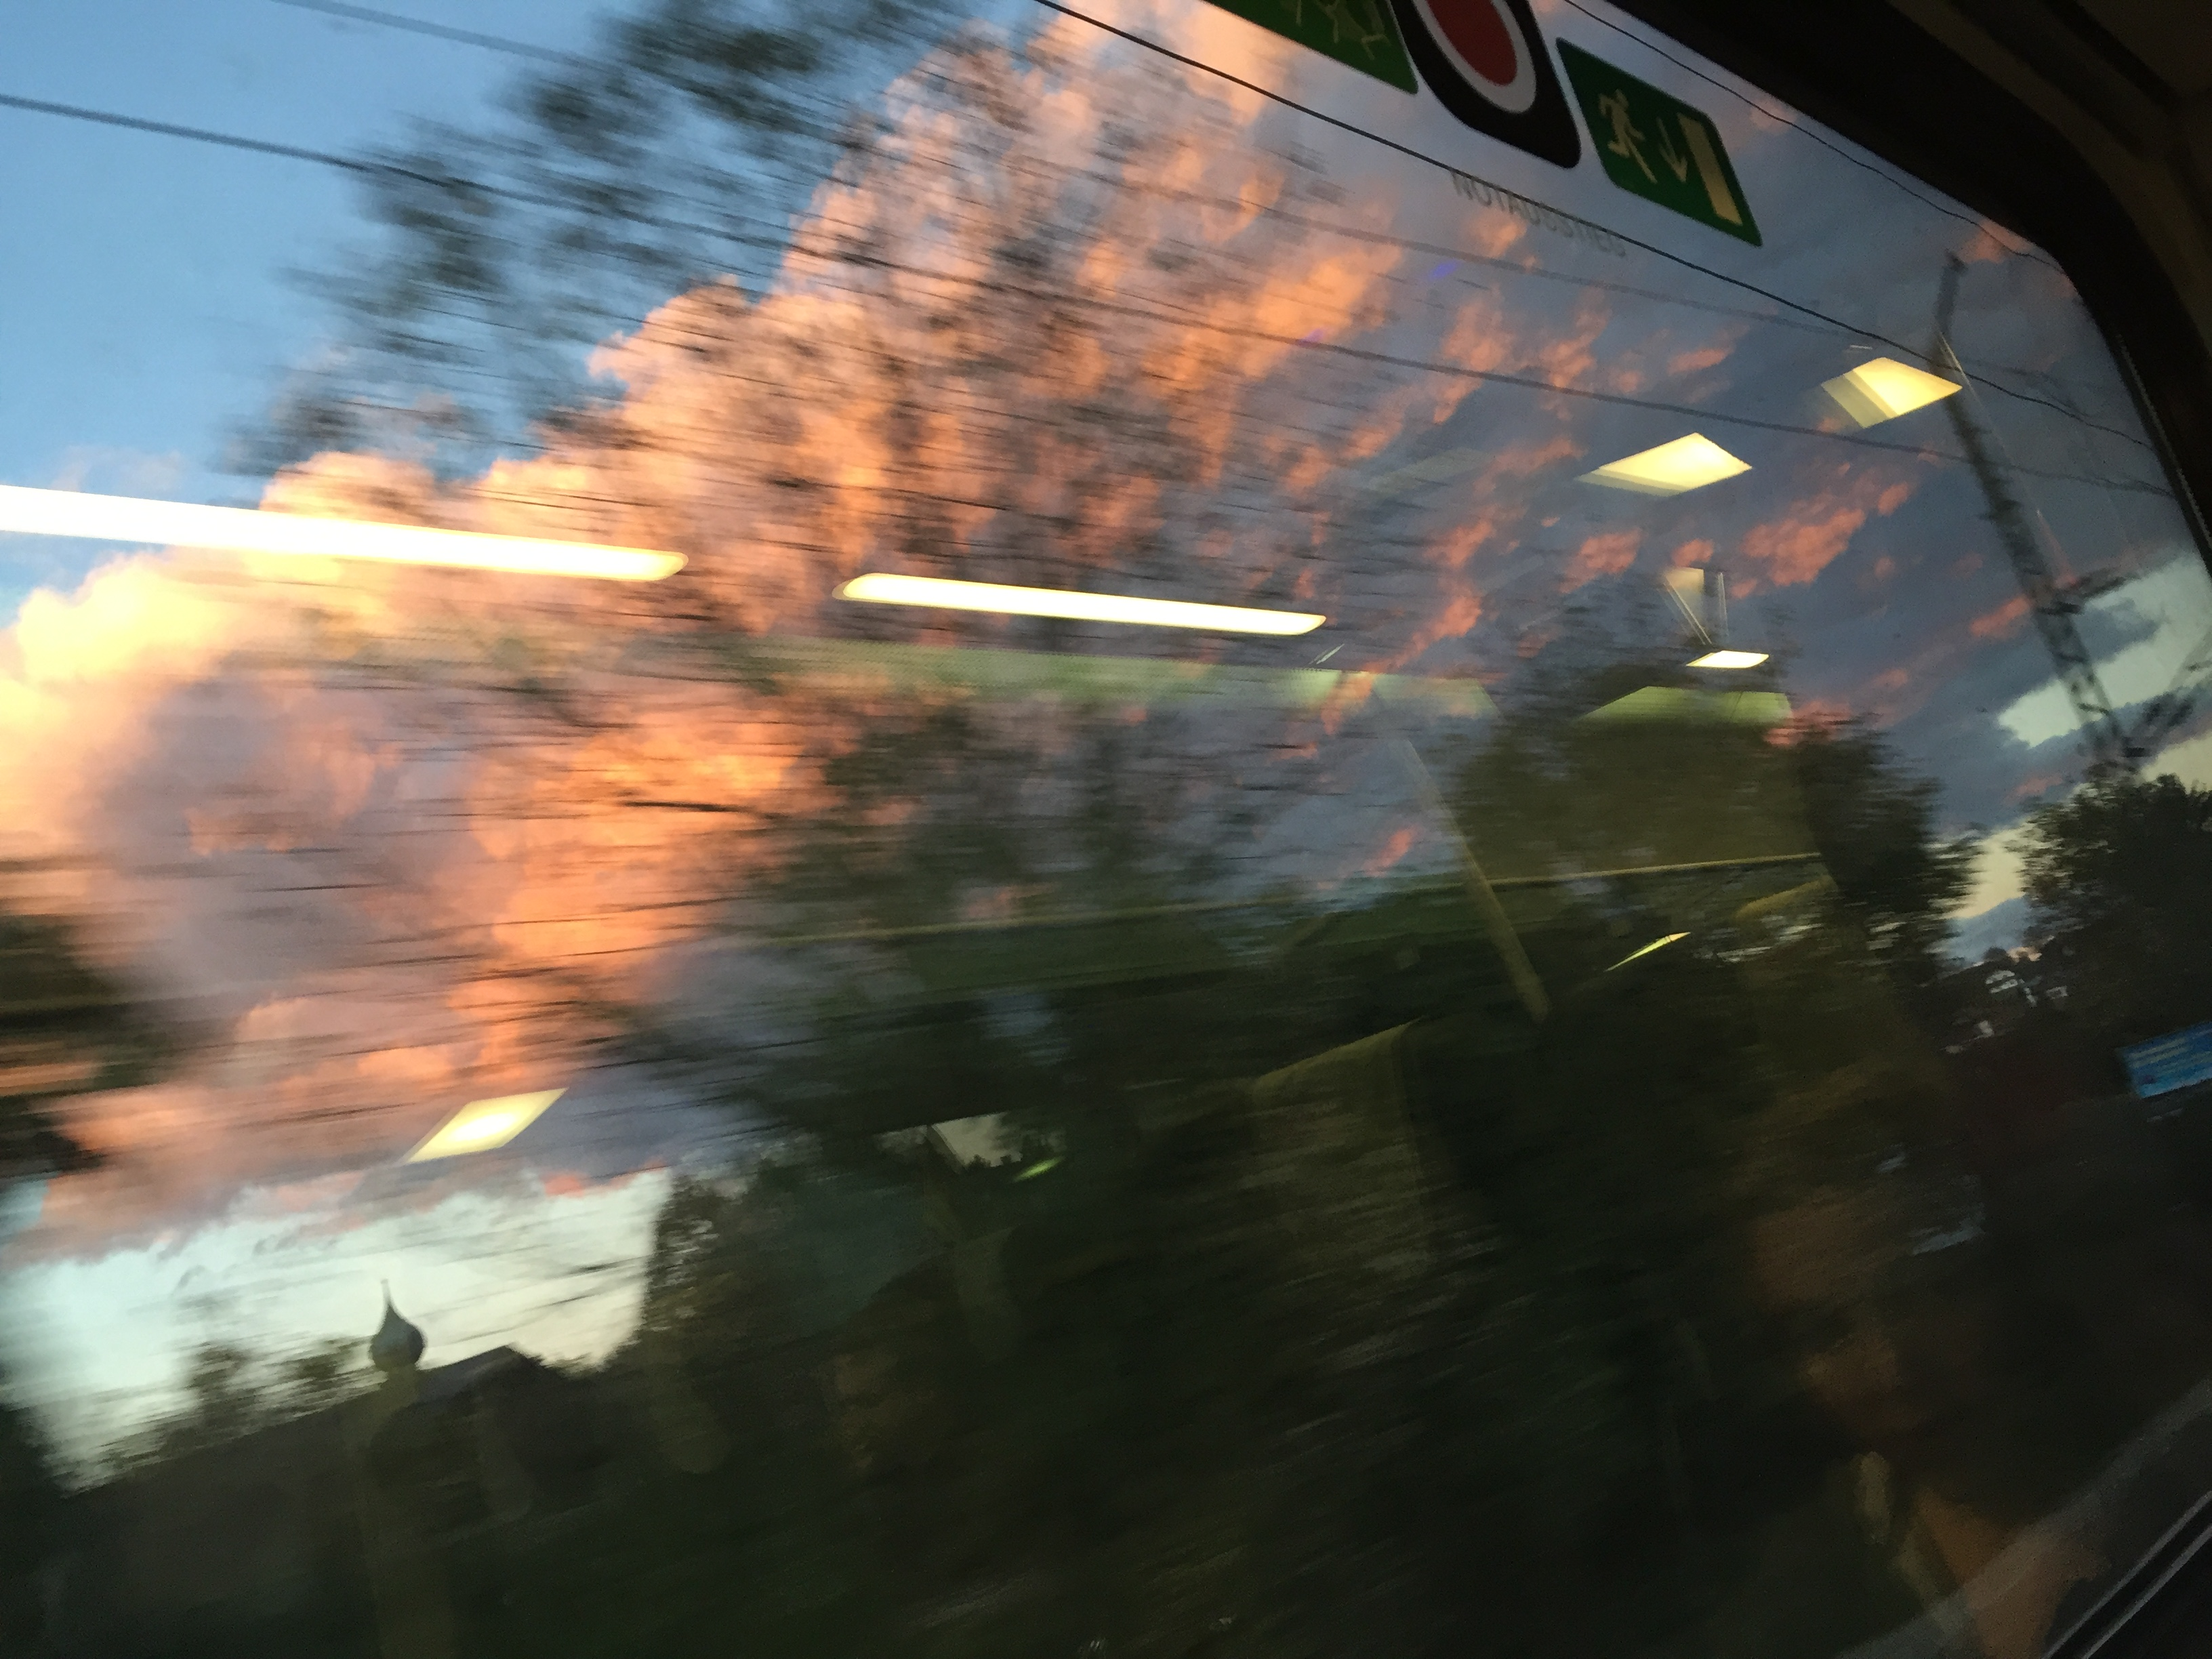 Zugsonnenuntergang